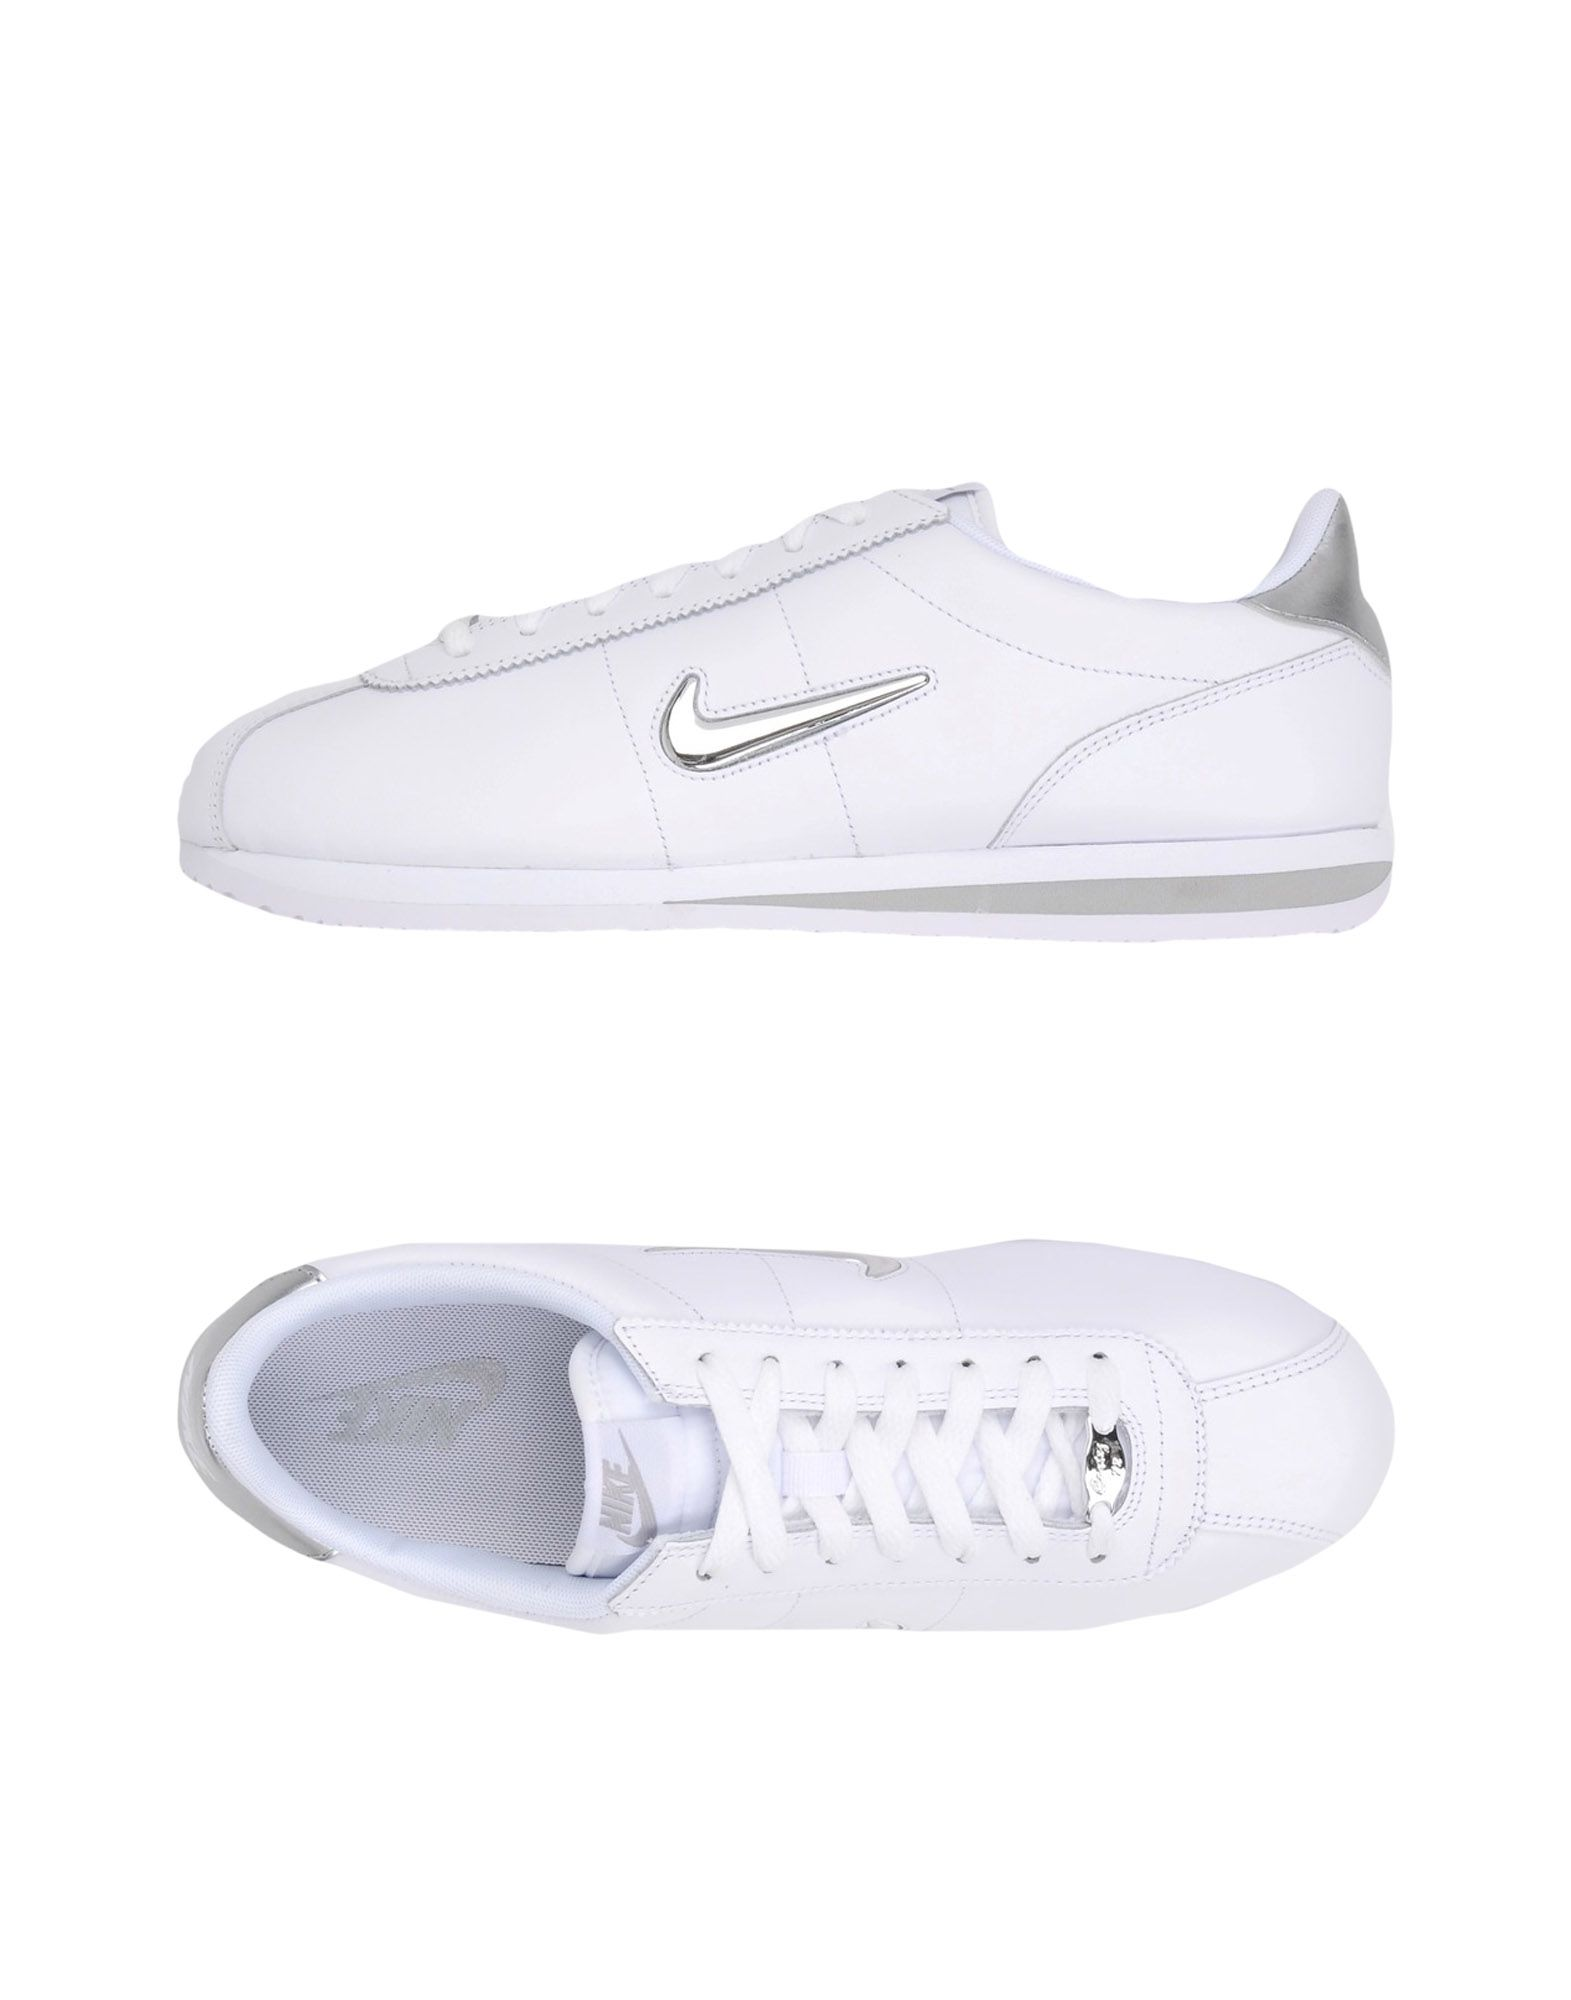 Sneakers Nike Cortez Basic Jewel -  Homme - Sneakers Nike  - Blanc Meilleur modèle de vente d45c1f